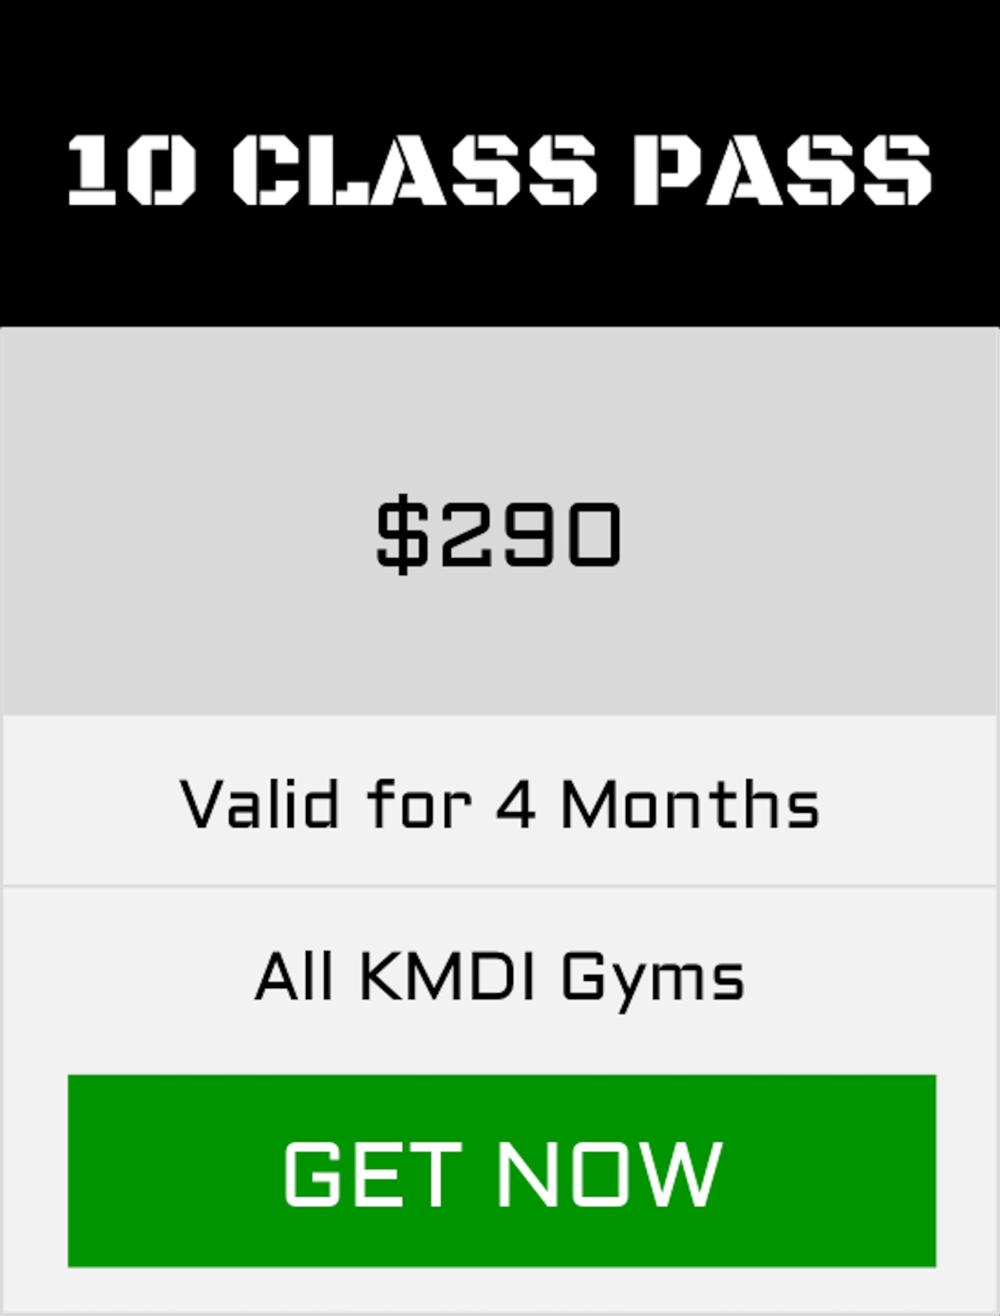 Membership-ClassPass.png